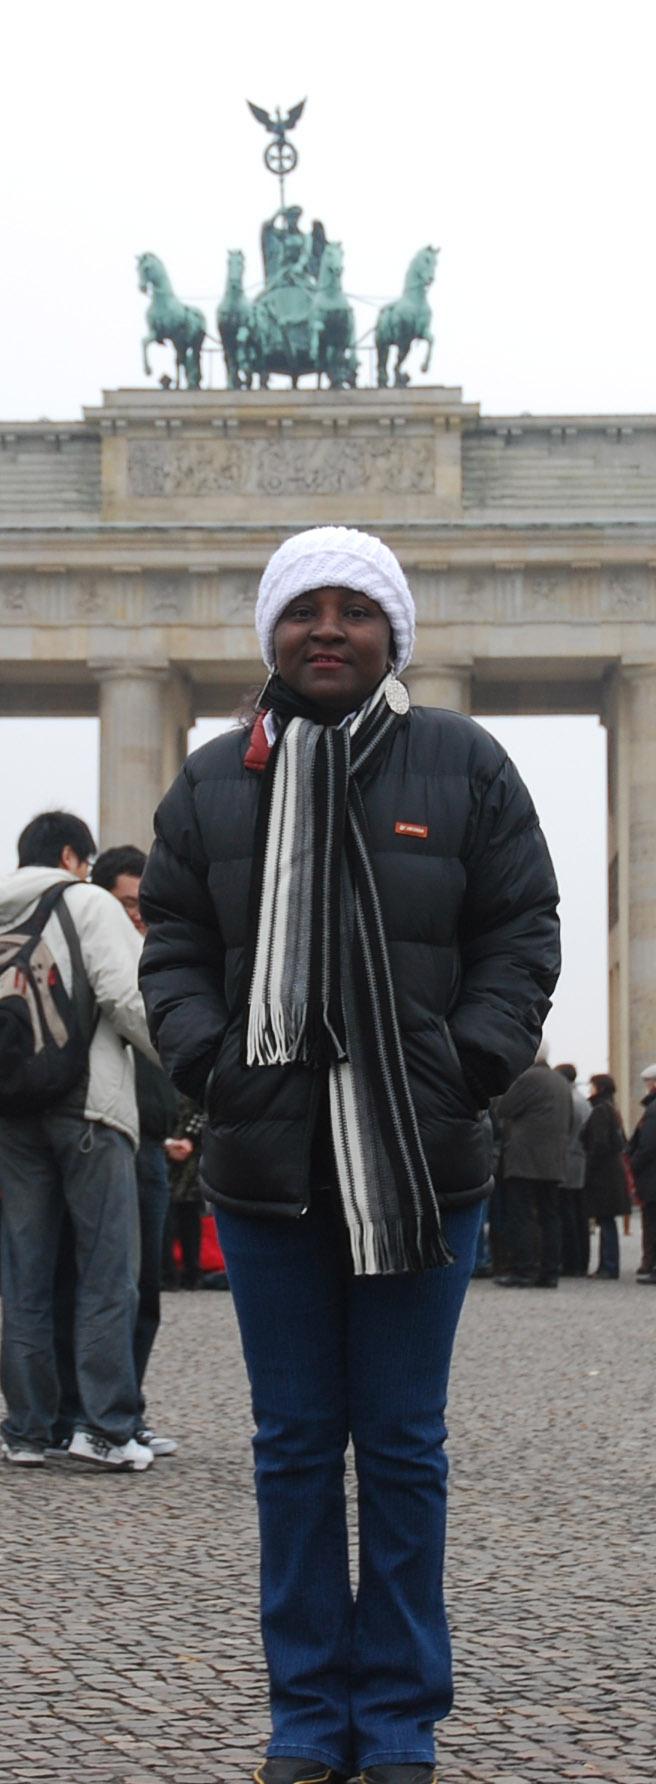 All weather tourist. At the Brandenburg Gate